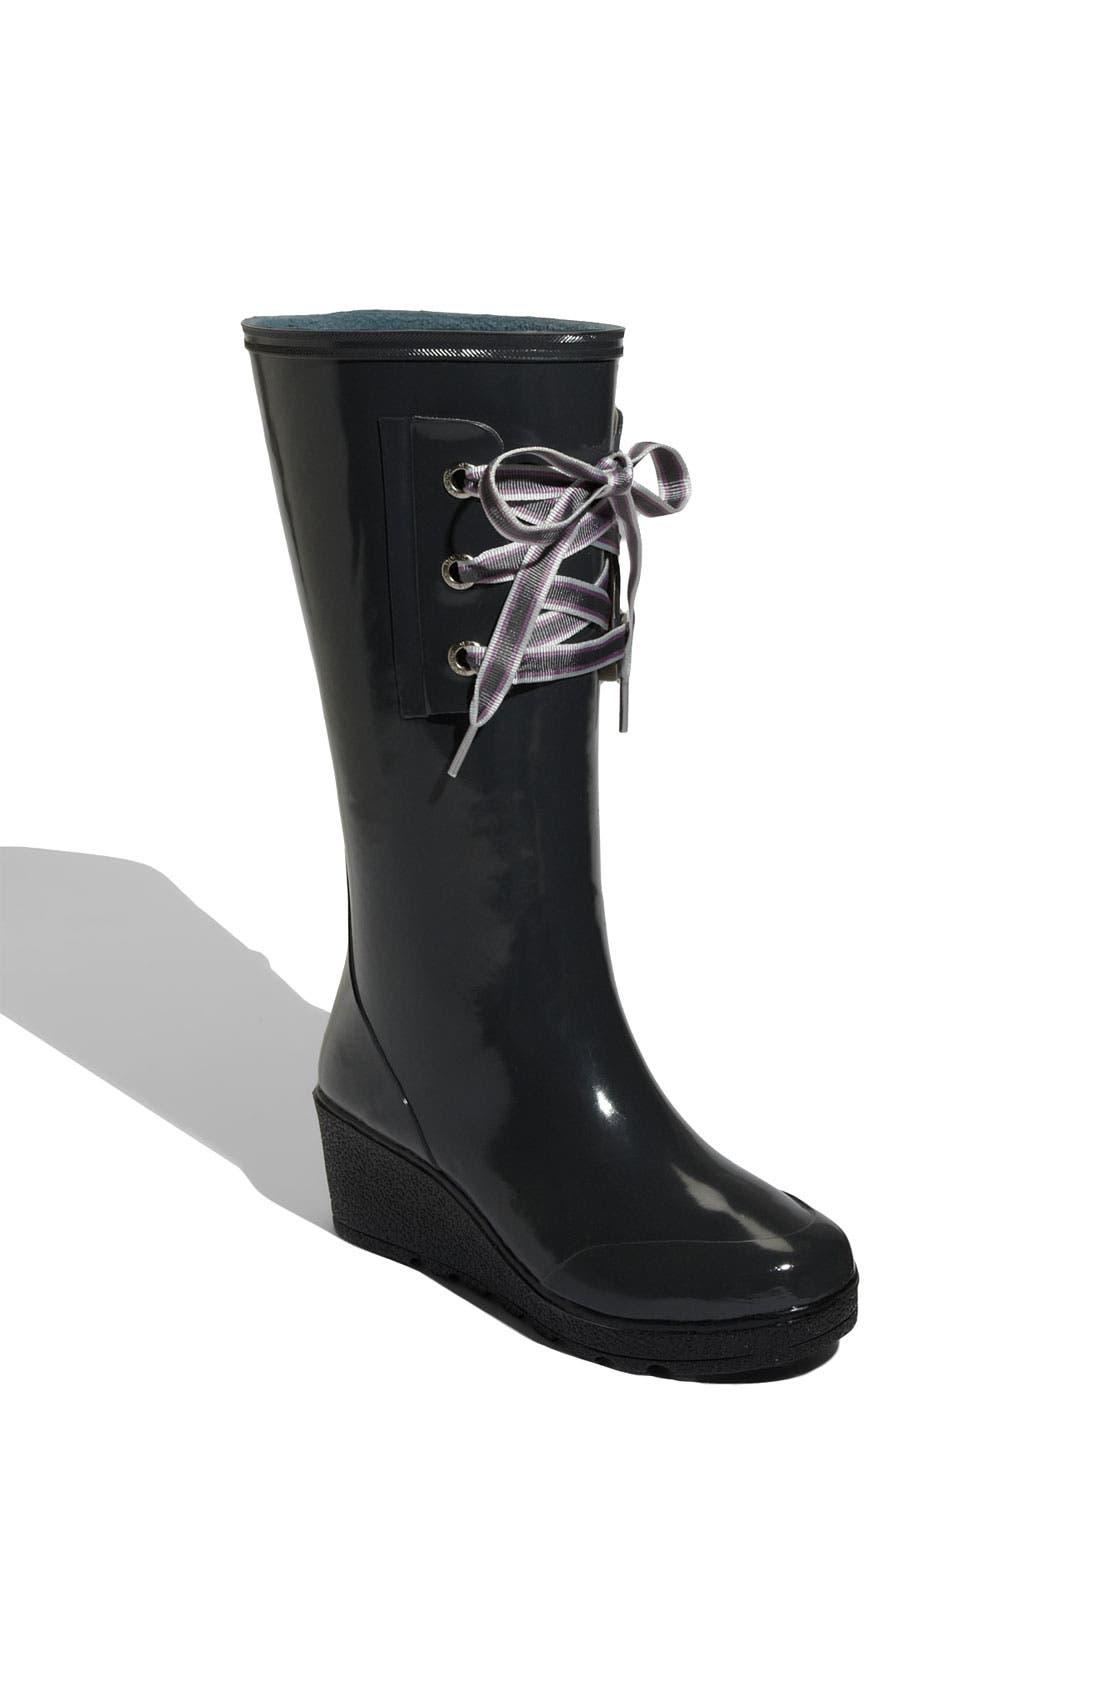 Alternate Image 1 Selected - Sperry Top-Sider® 'Sadie' Rain Boot